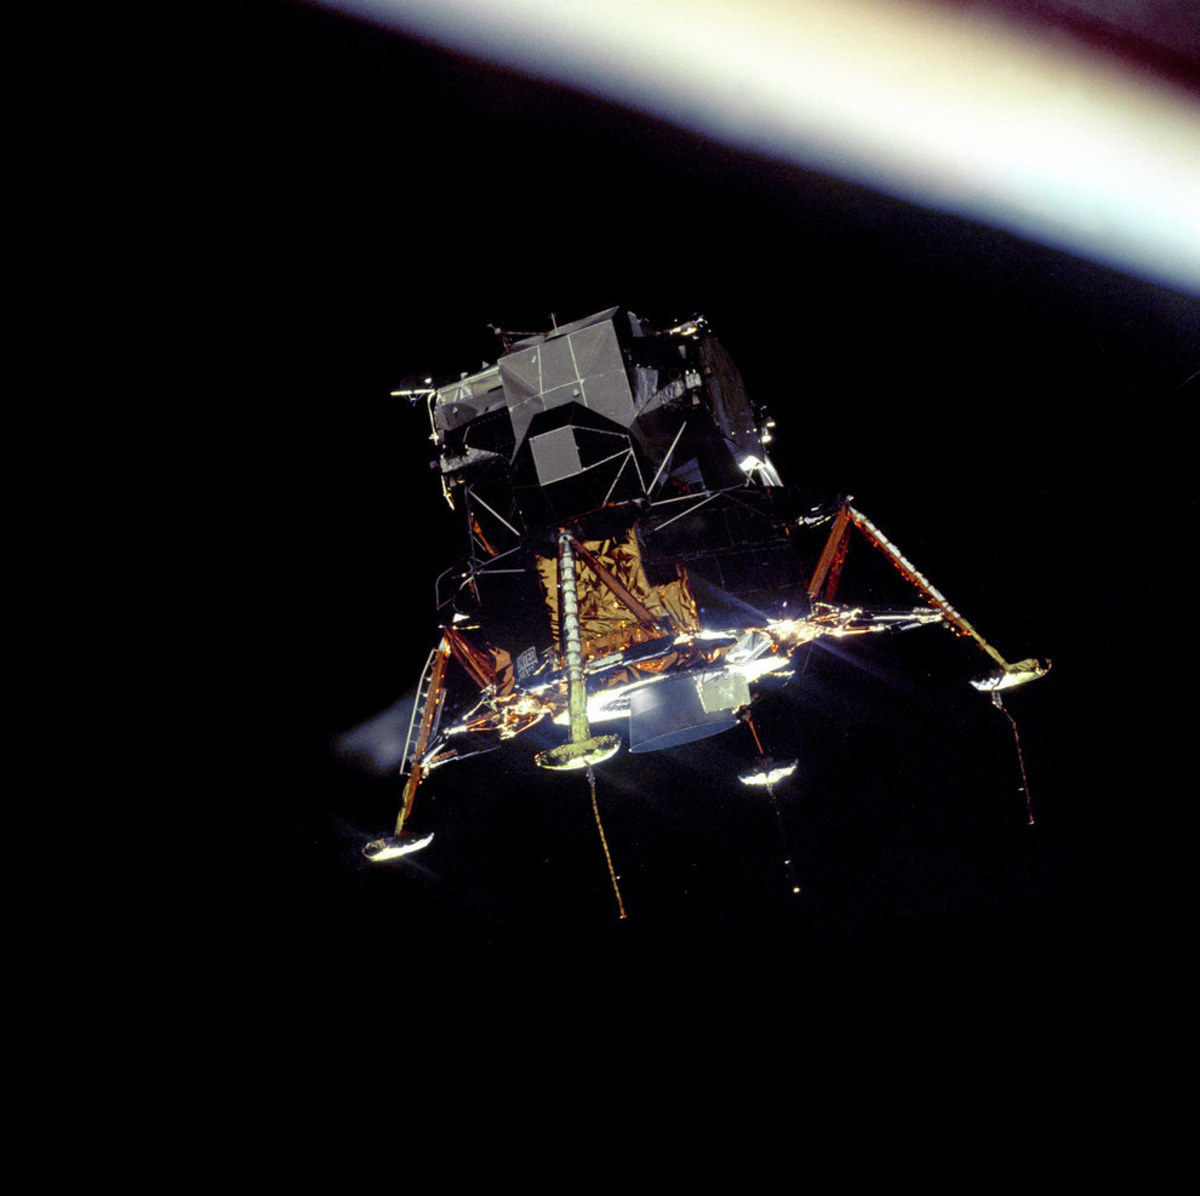 Lunar Lander - Apollo Mission